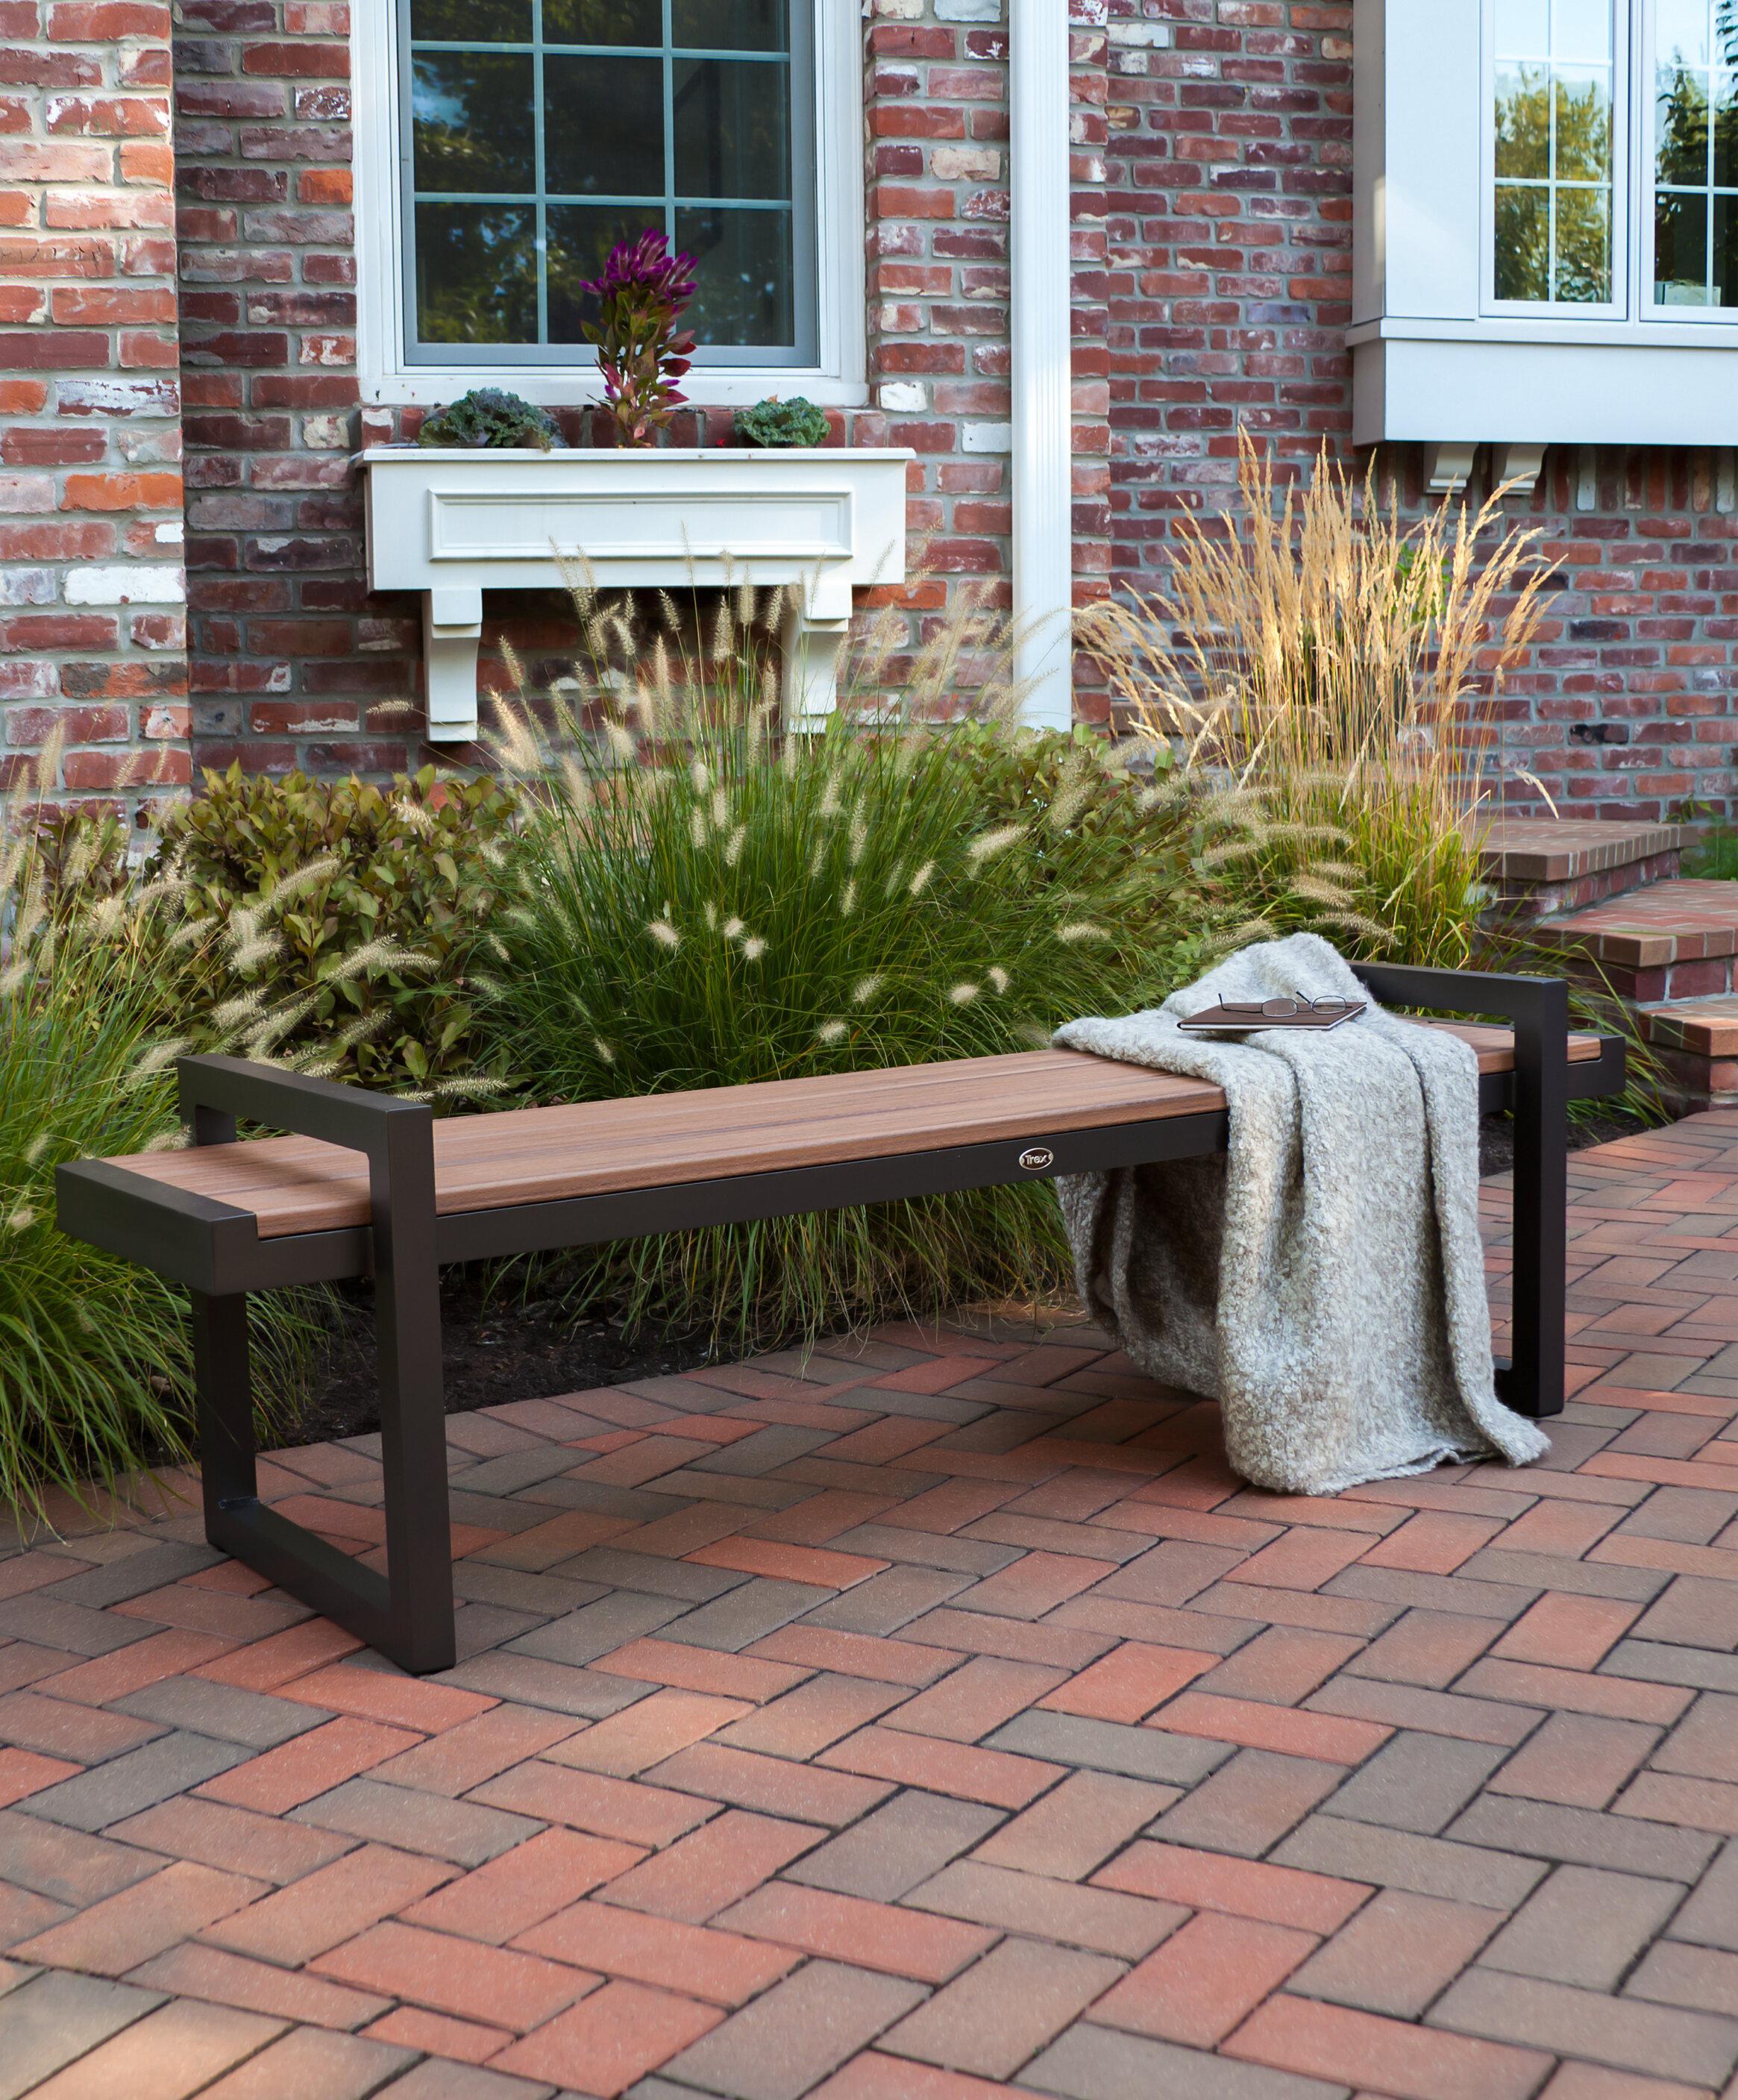 Genial Trex Century Plastic Garden Bench U0026 Reviews | Wayfair